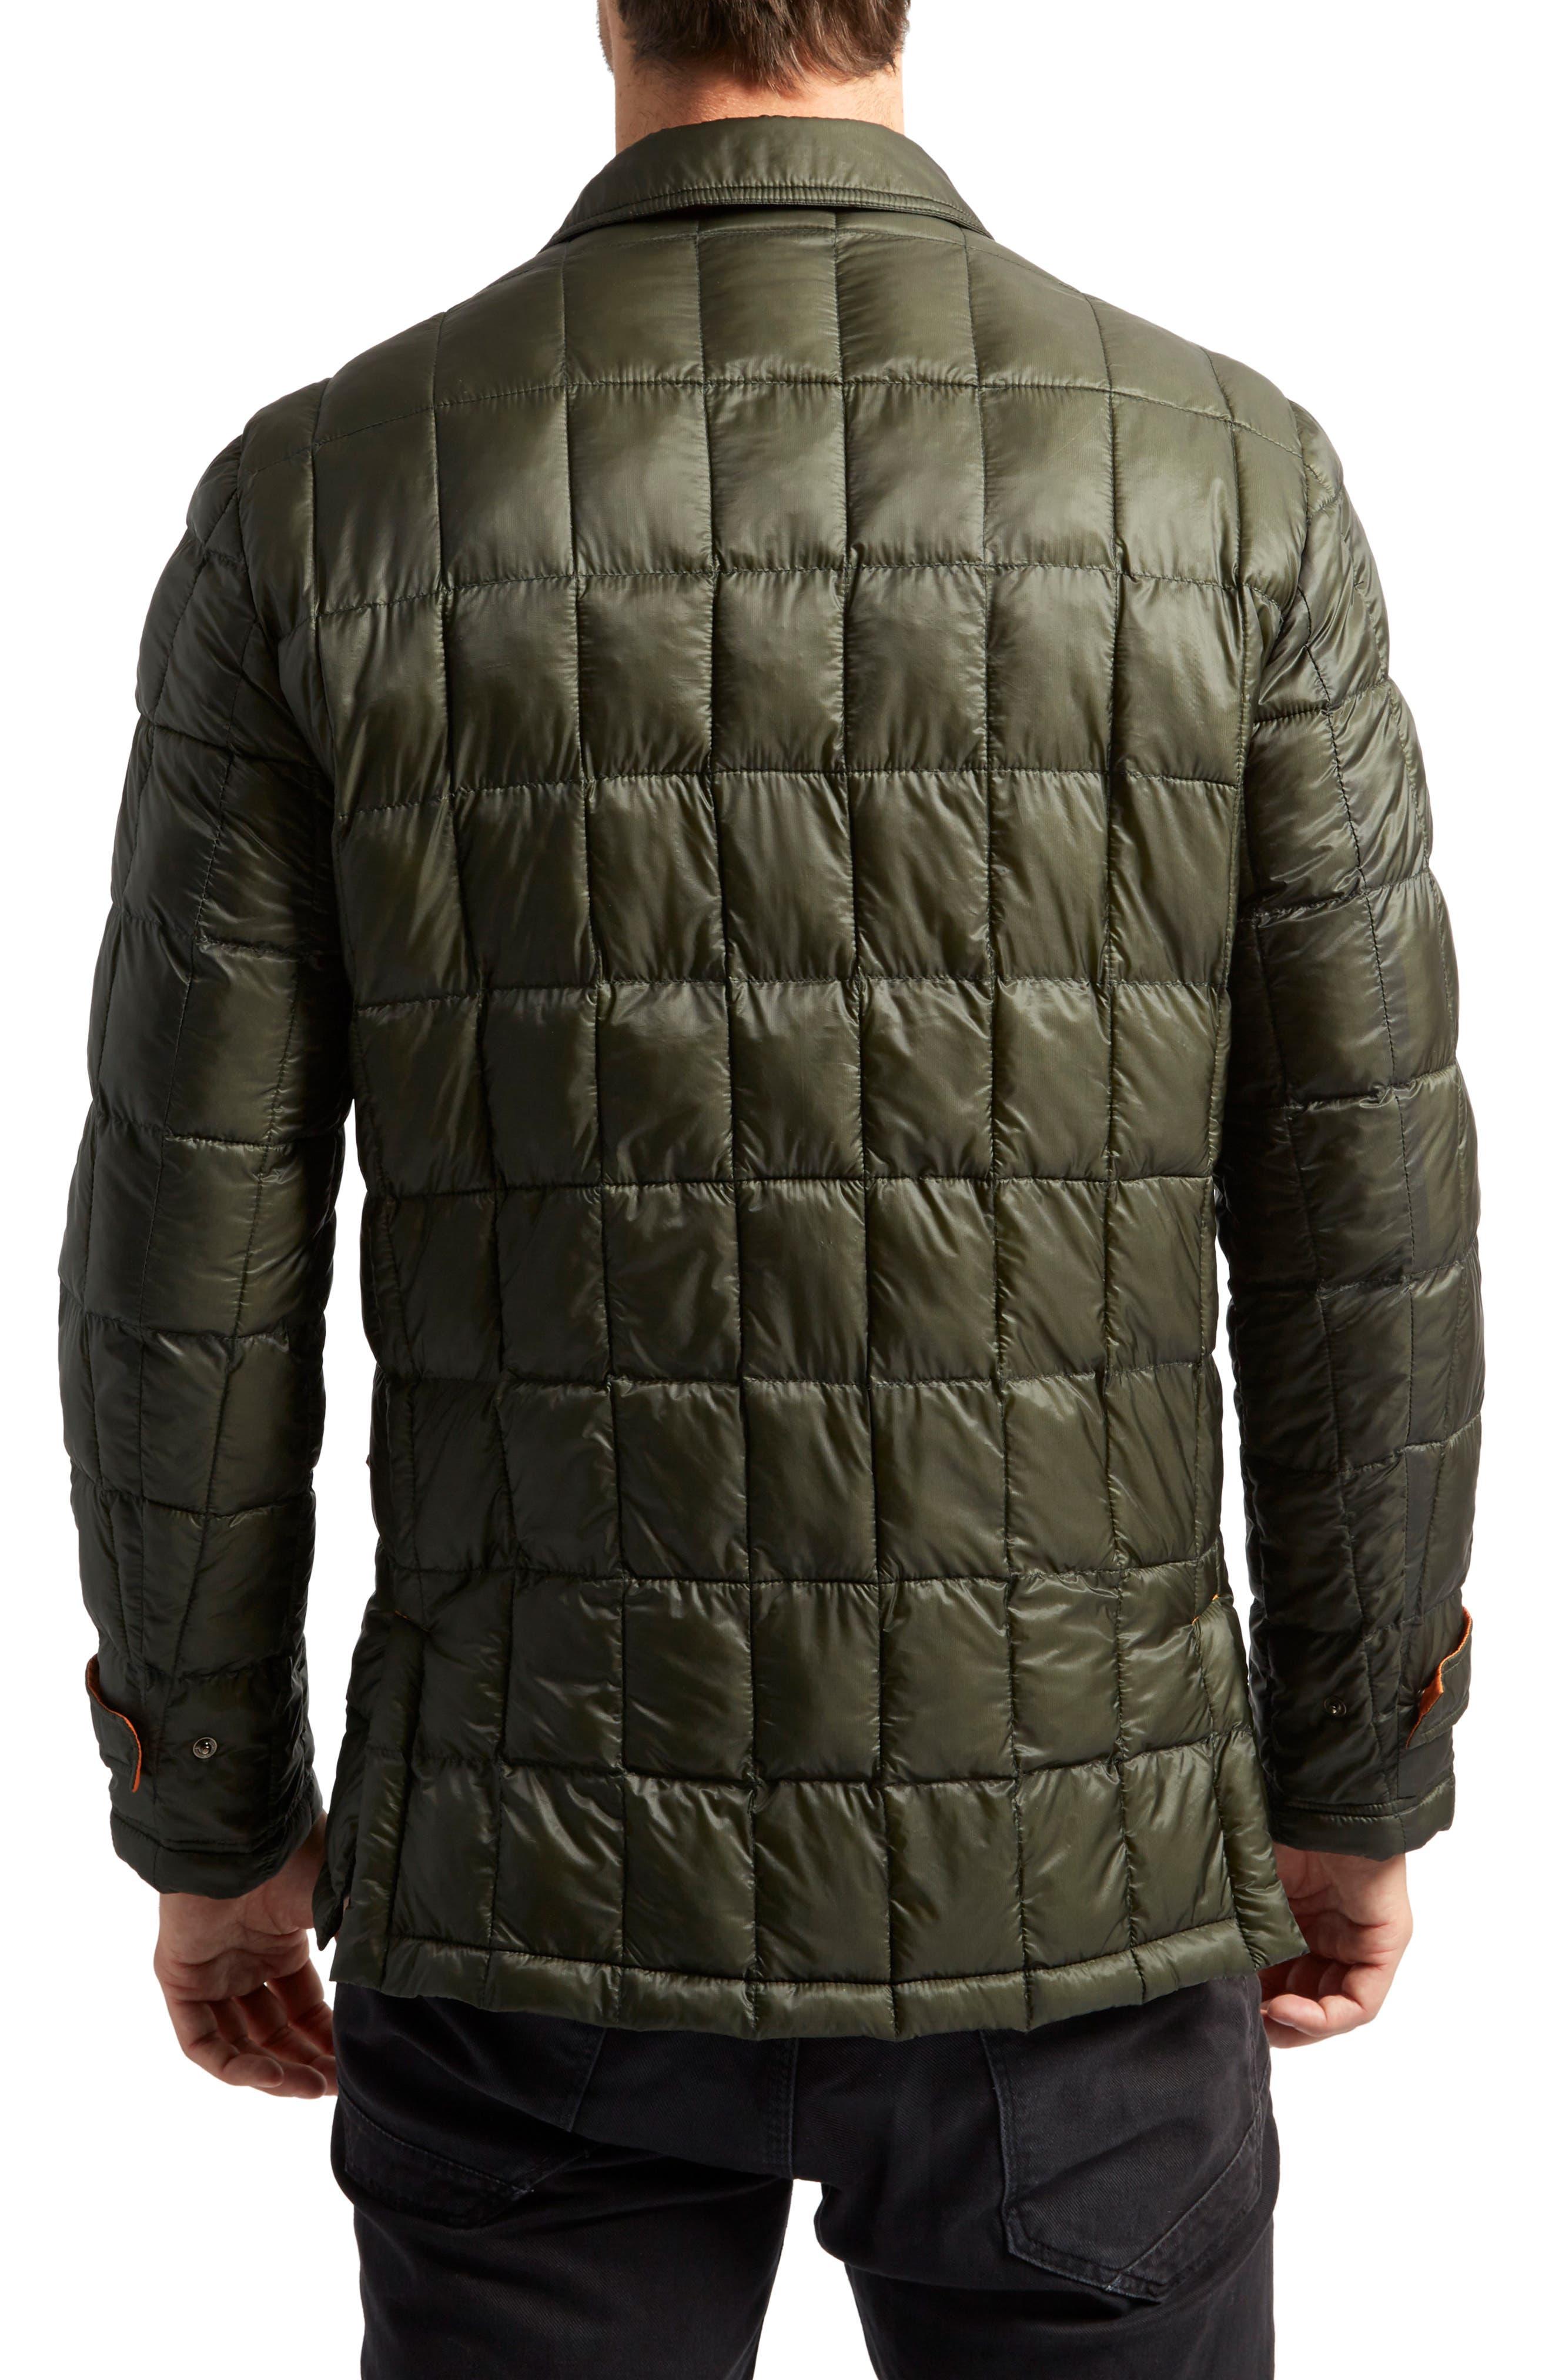 Butler Heat System Quilted Walking Jacket,                             Alternate thumbnail 2, color,                             Kale